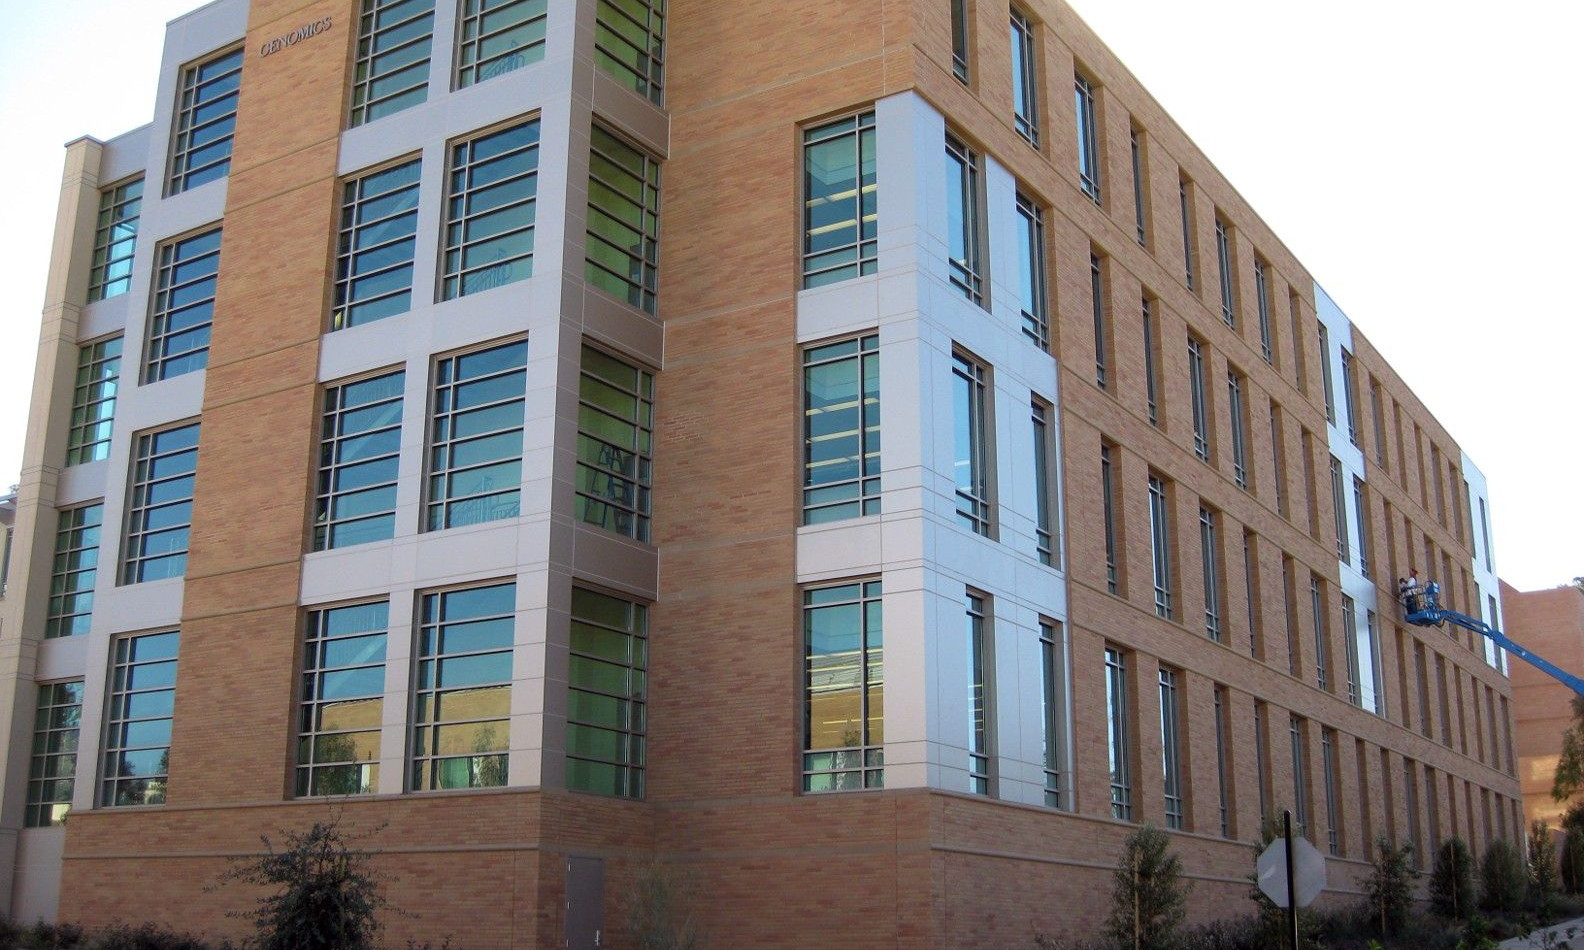 UCR Genomics Building